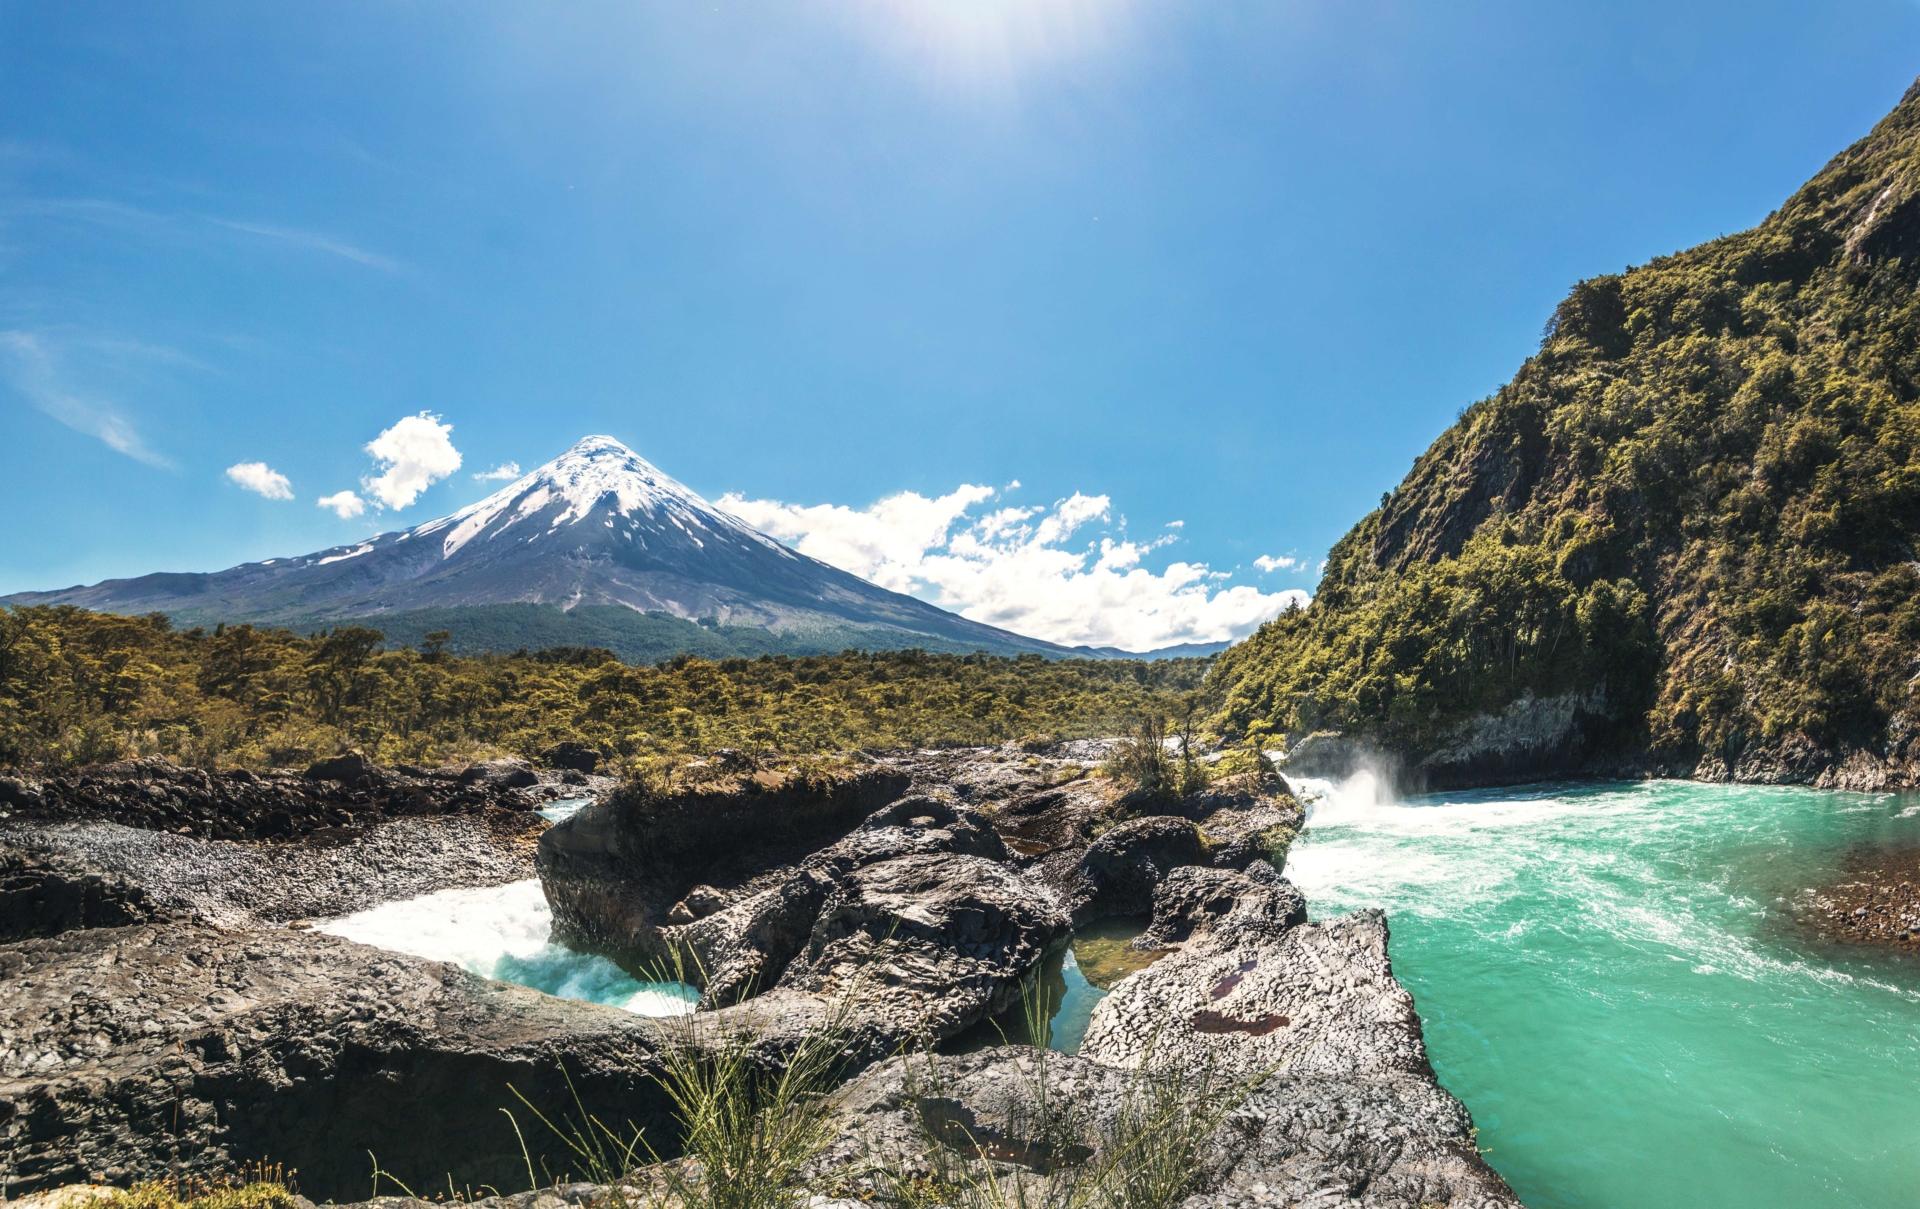 volcan-osorno-los-lagos-chili